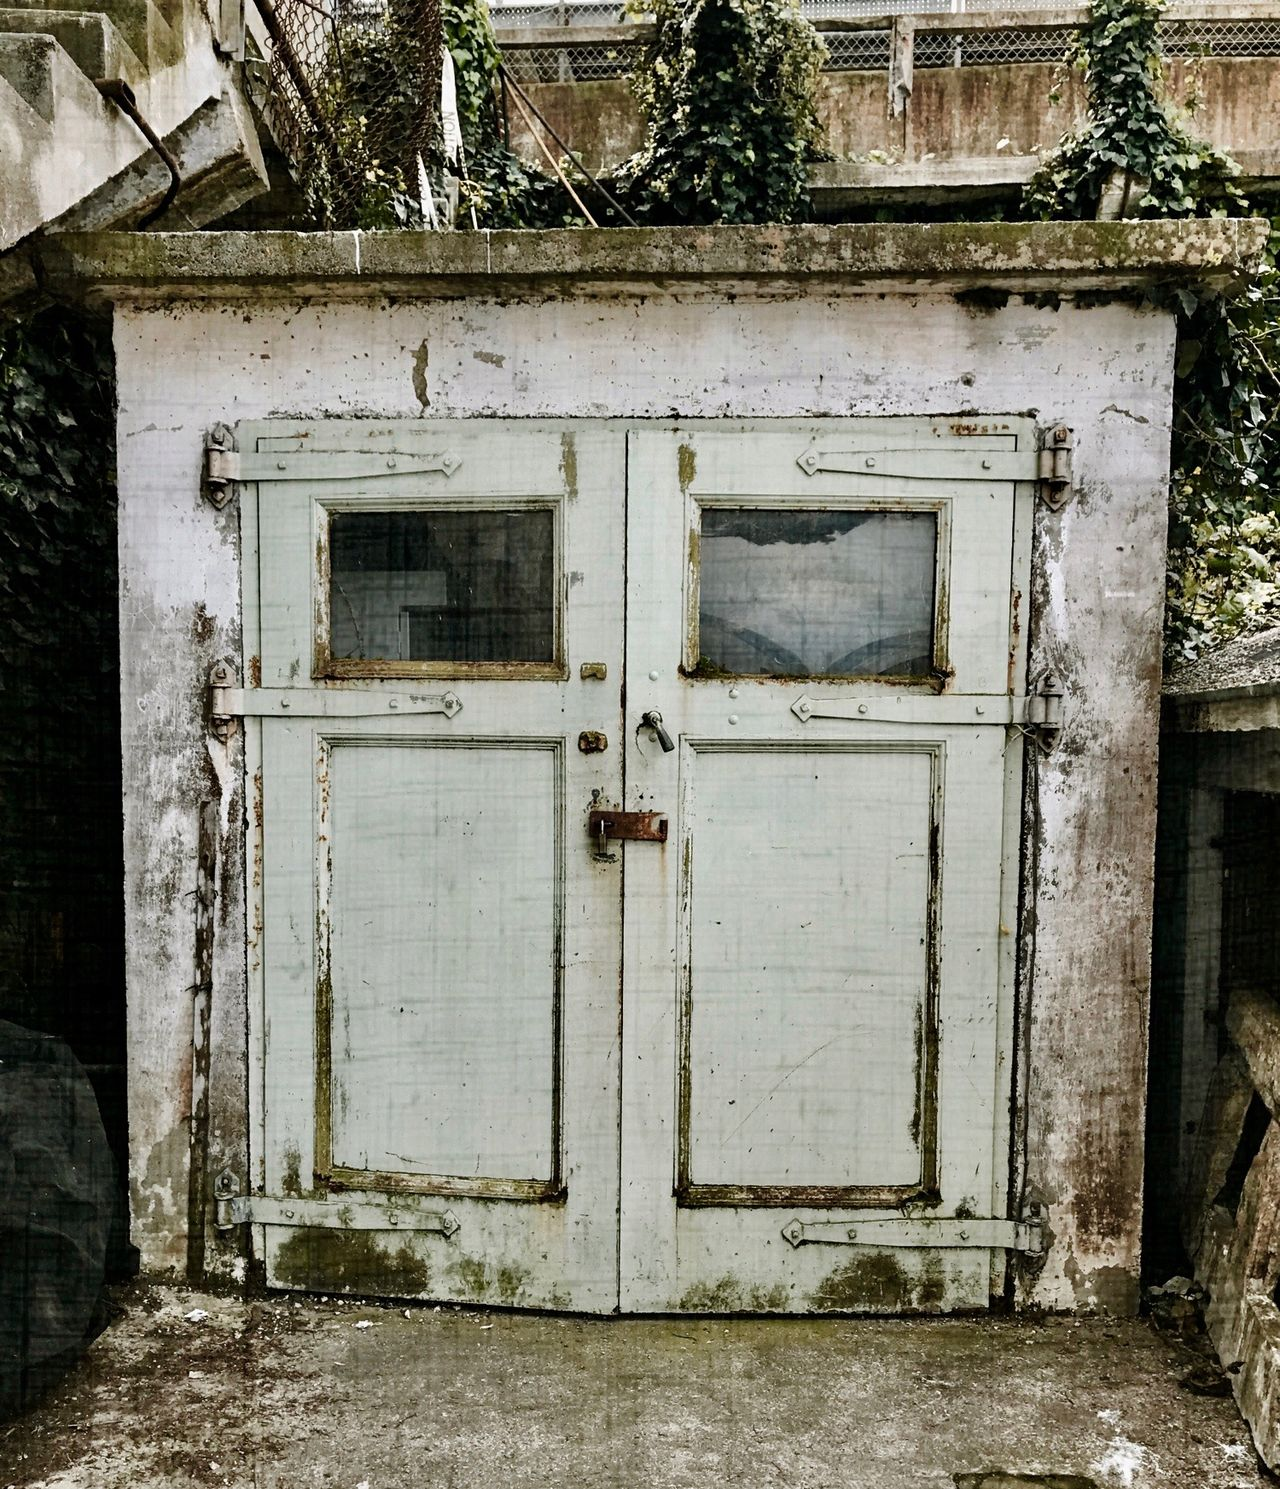 Alcatraz Morgue Doors Alcatraz Morgue Doors Architecture Building Exterior Built Structure Door Garden EyeEmNewHere EyeEmNewHere The Secret Spaces Art Is Everywhere